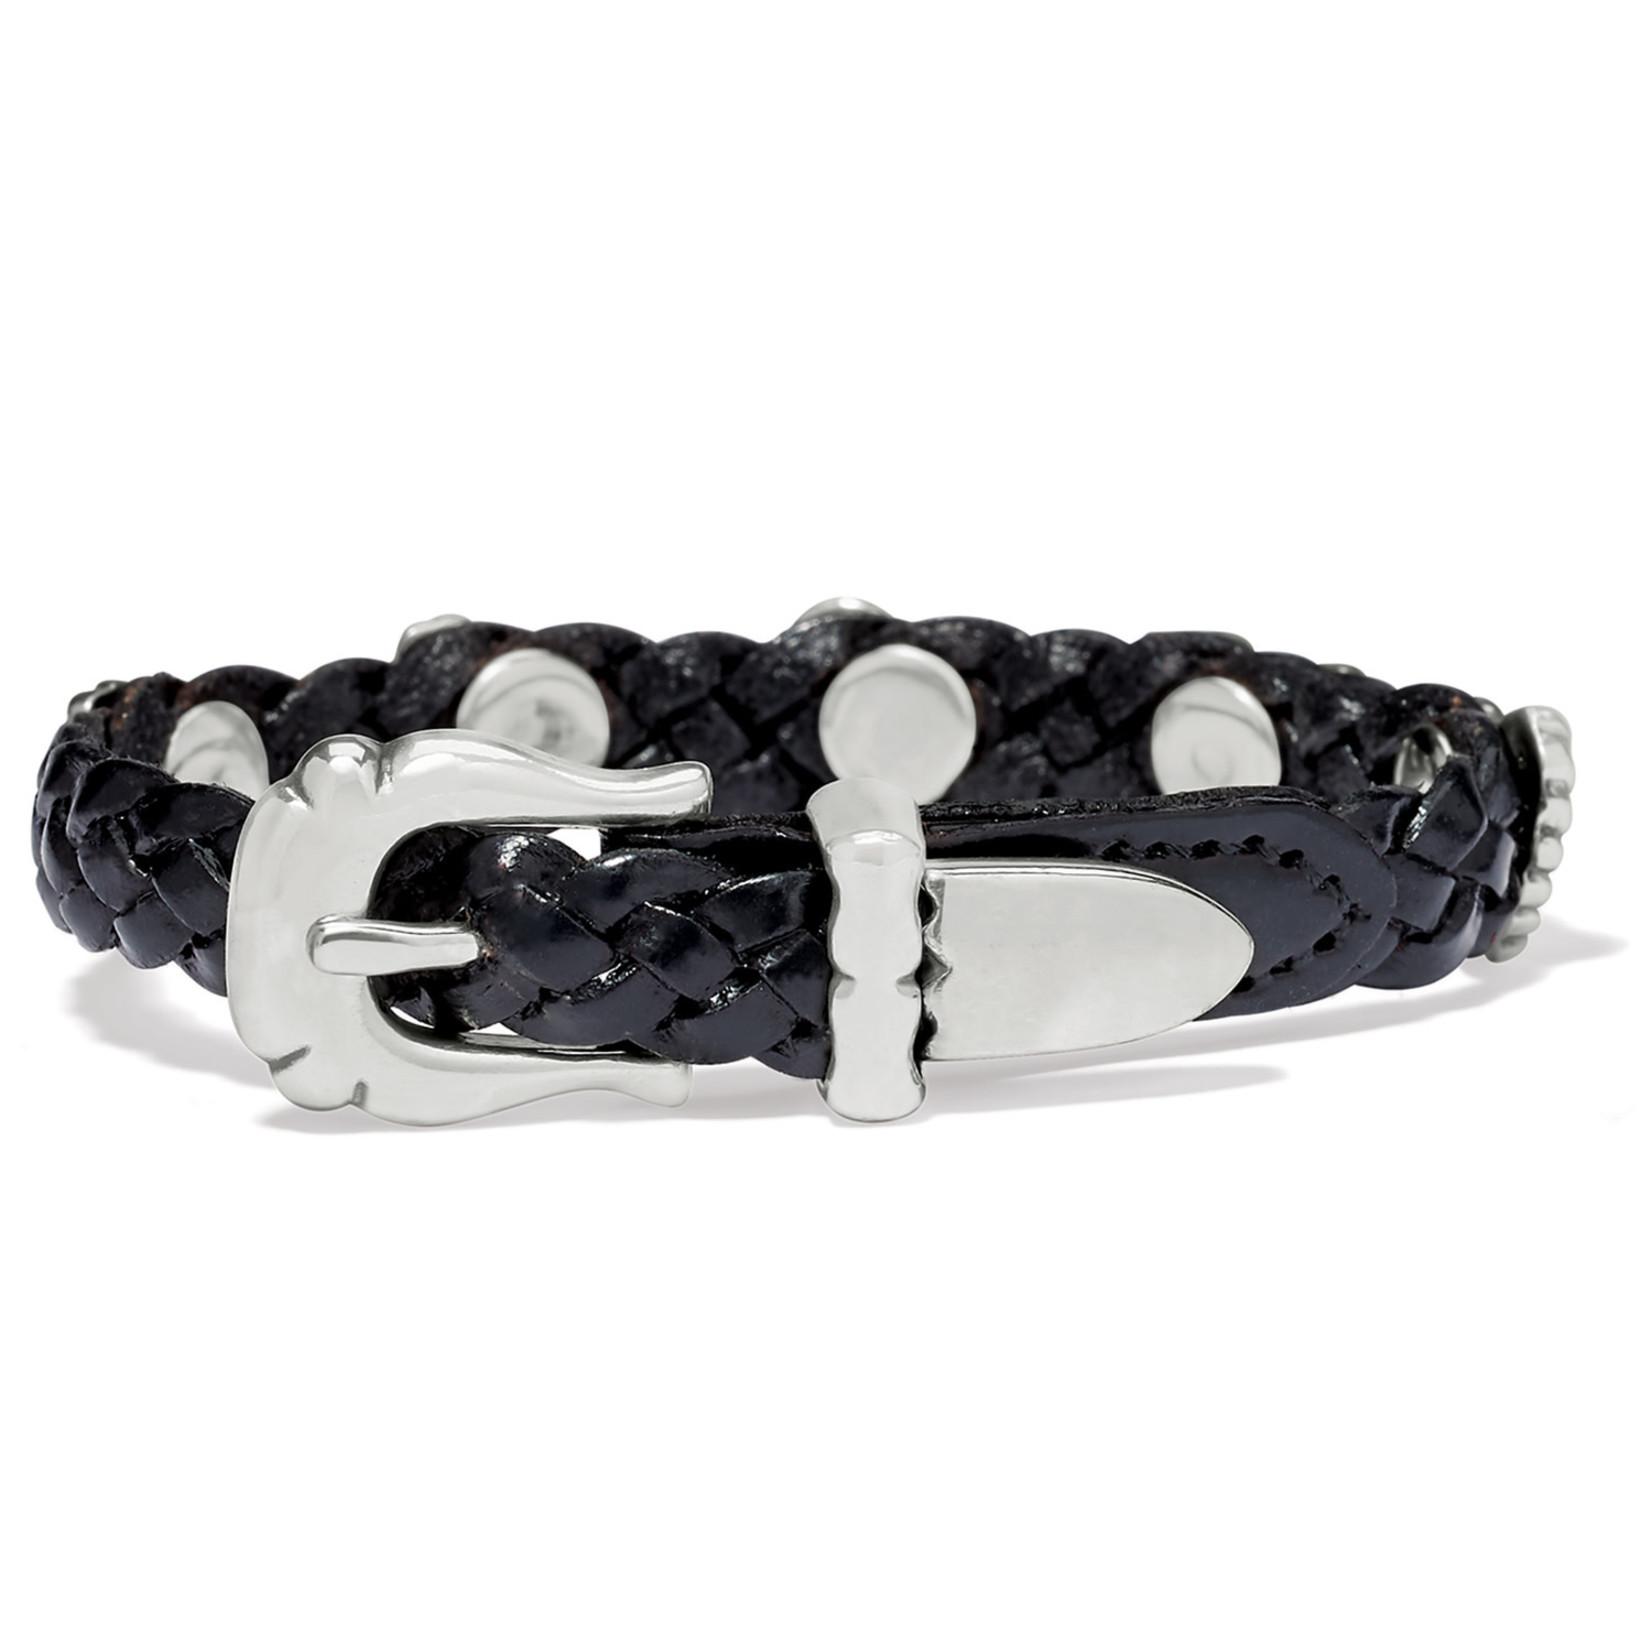 Brighton Roped Heart Braid Bandit Bracelet - Black